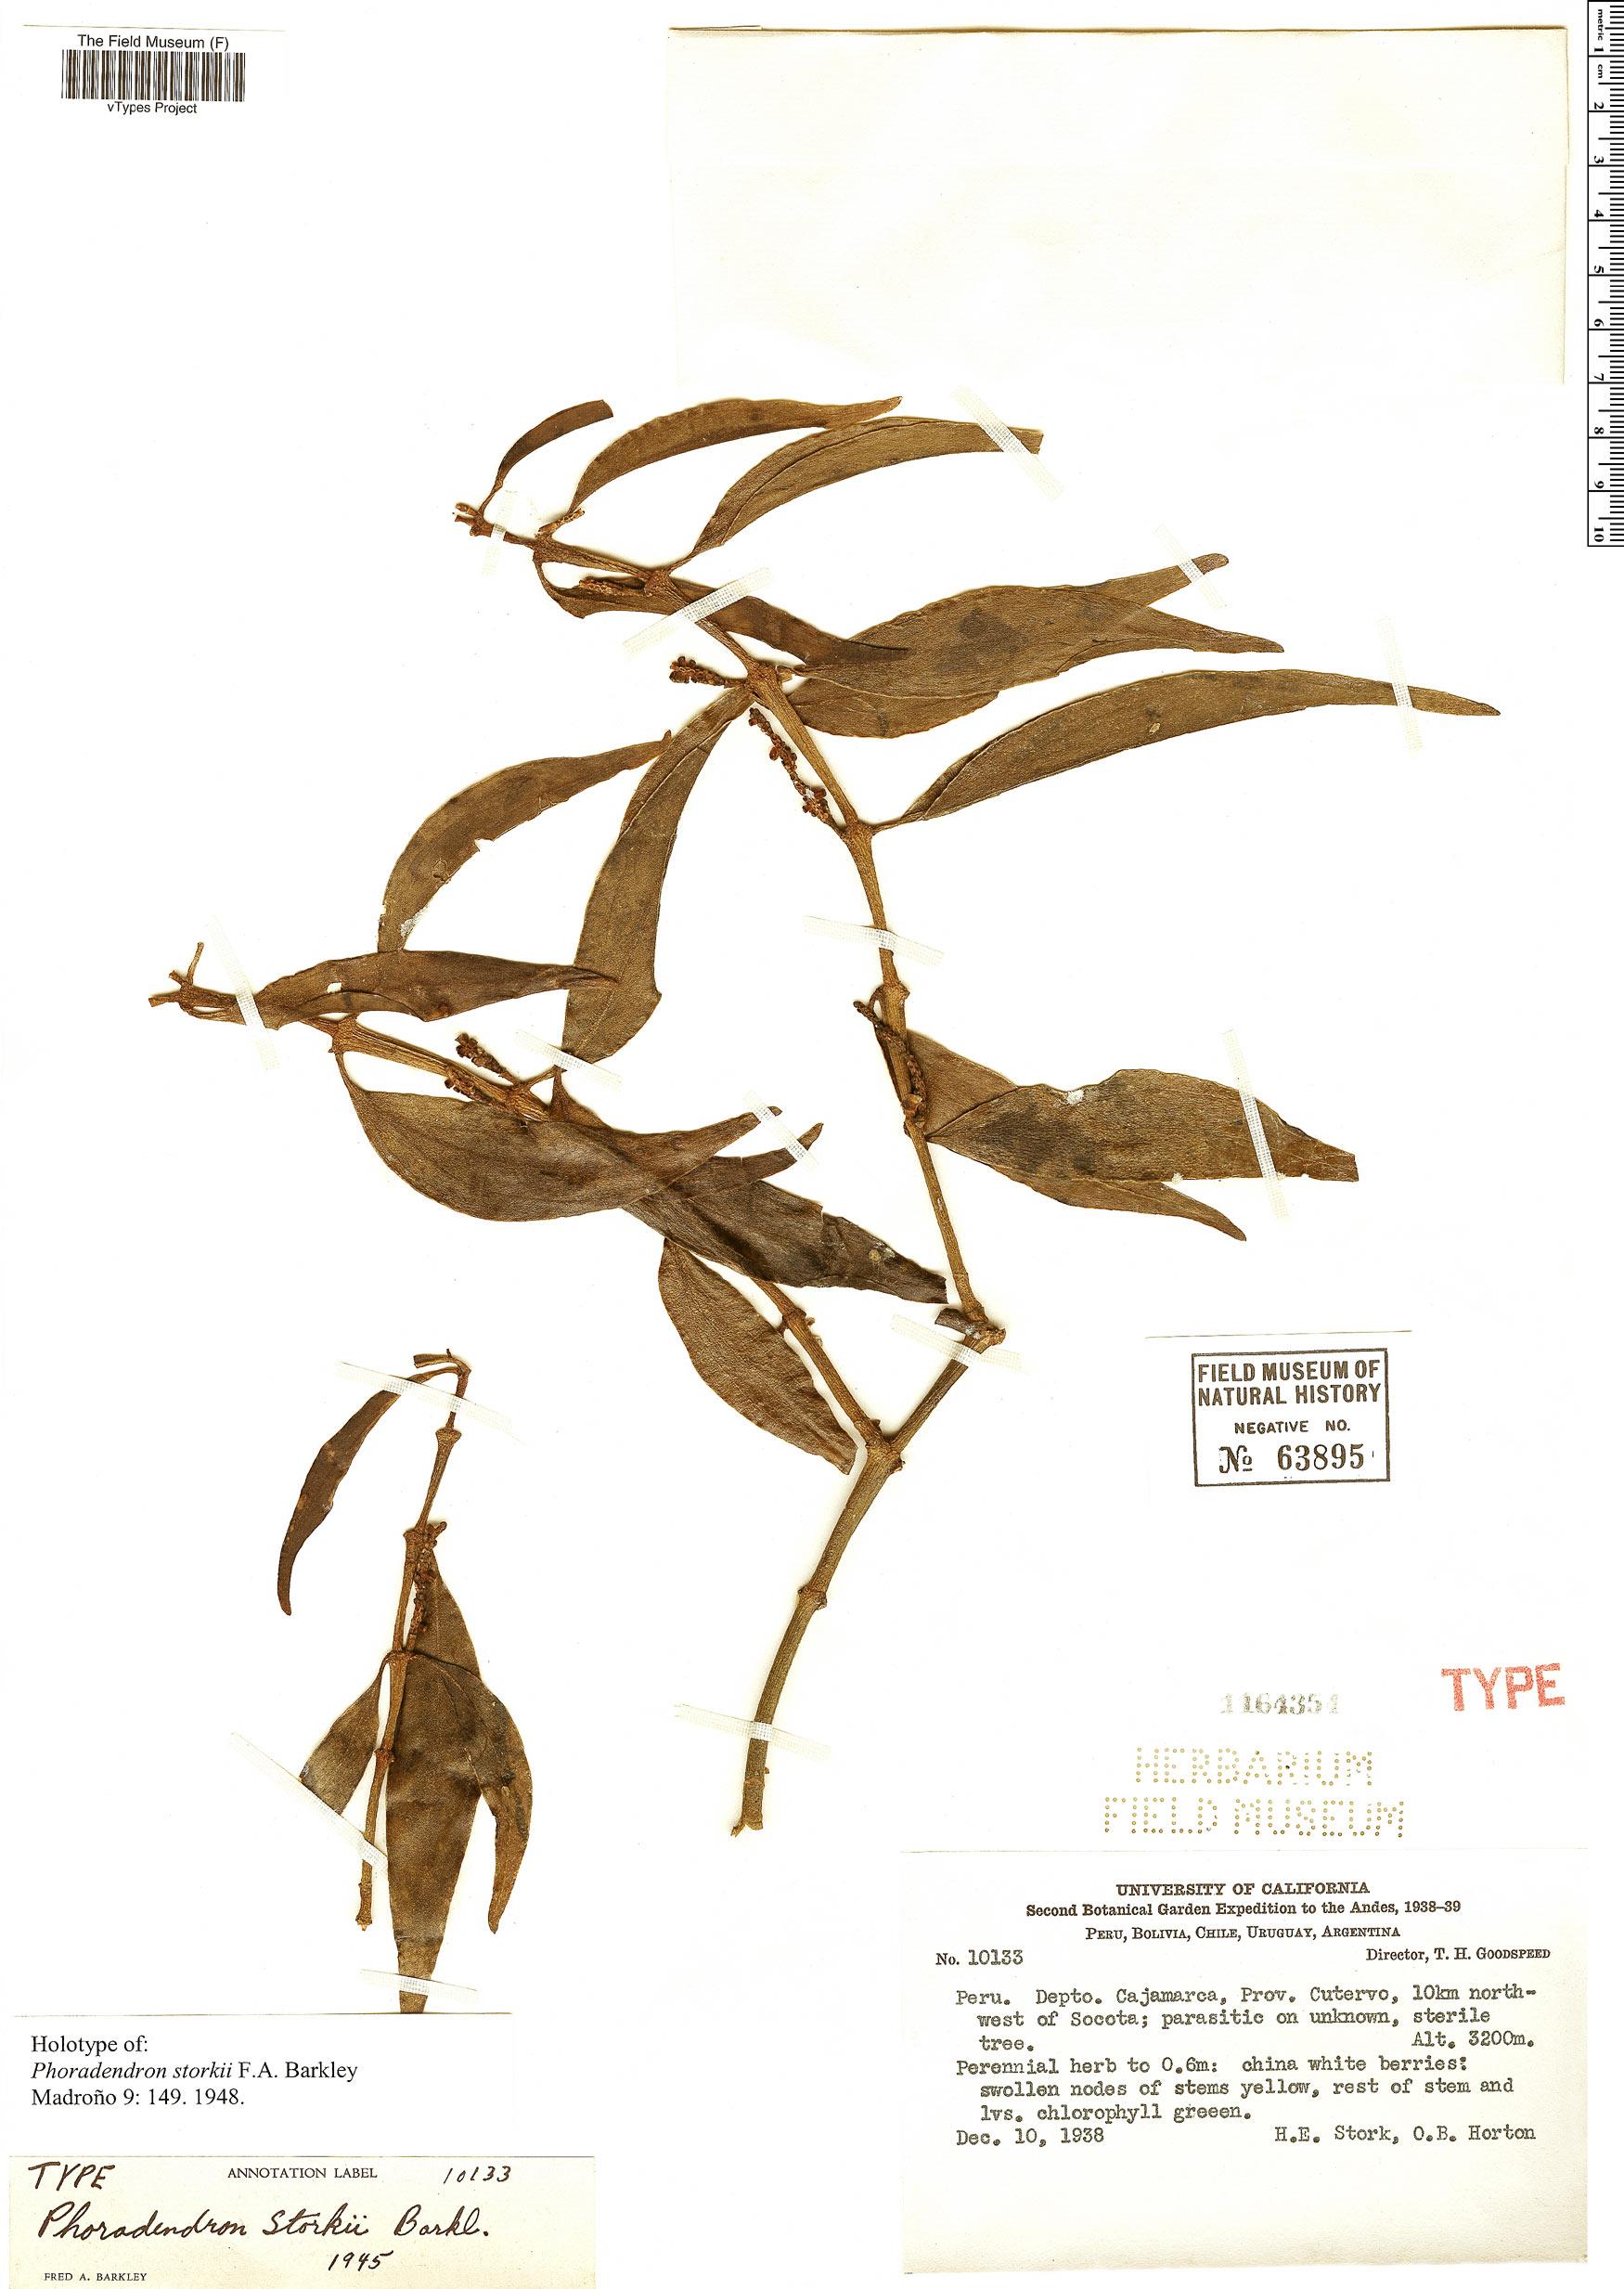 Specimen: Phoradendron storkii